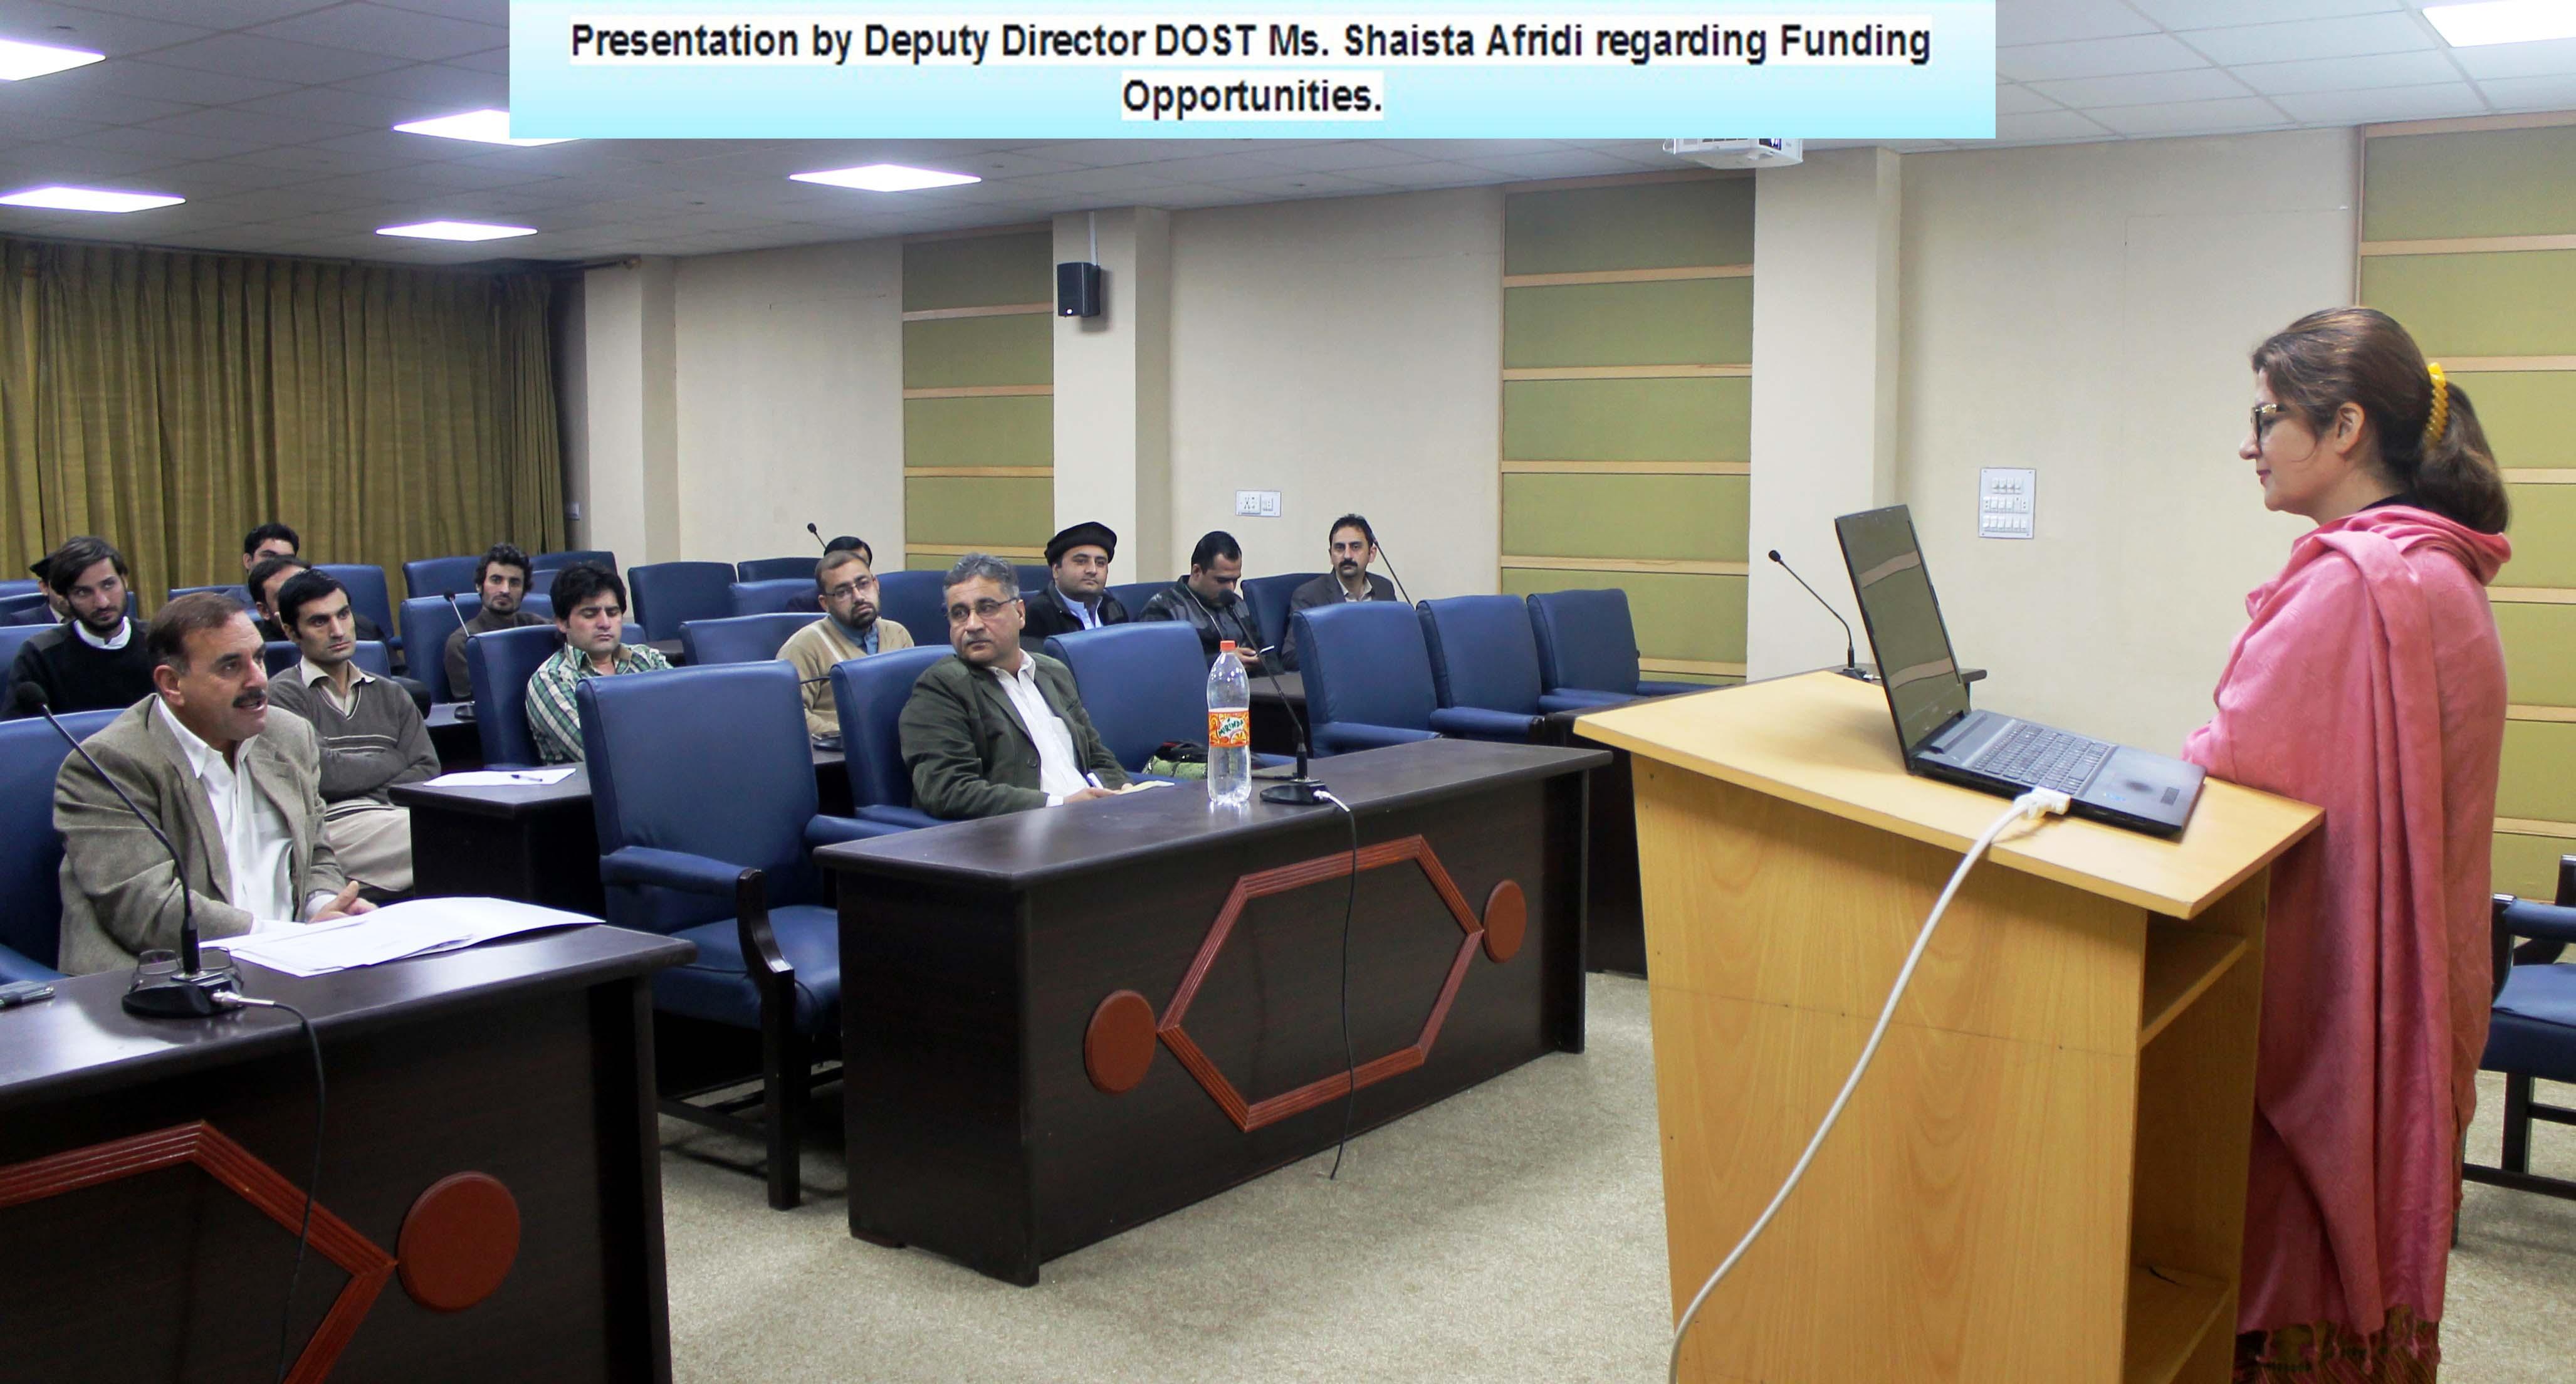 Presentation By Deputy Director DOST Ms. Shaista Afridi regarding Funding Opportunities.